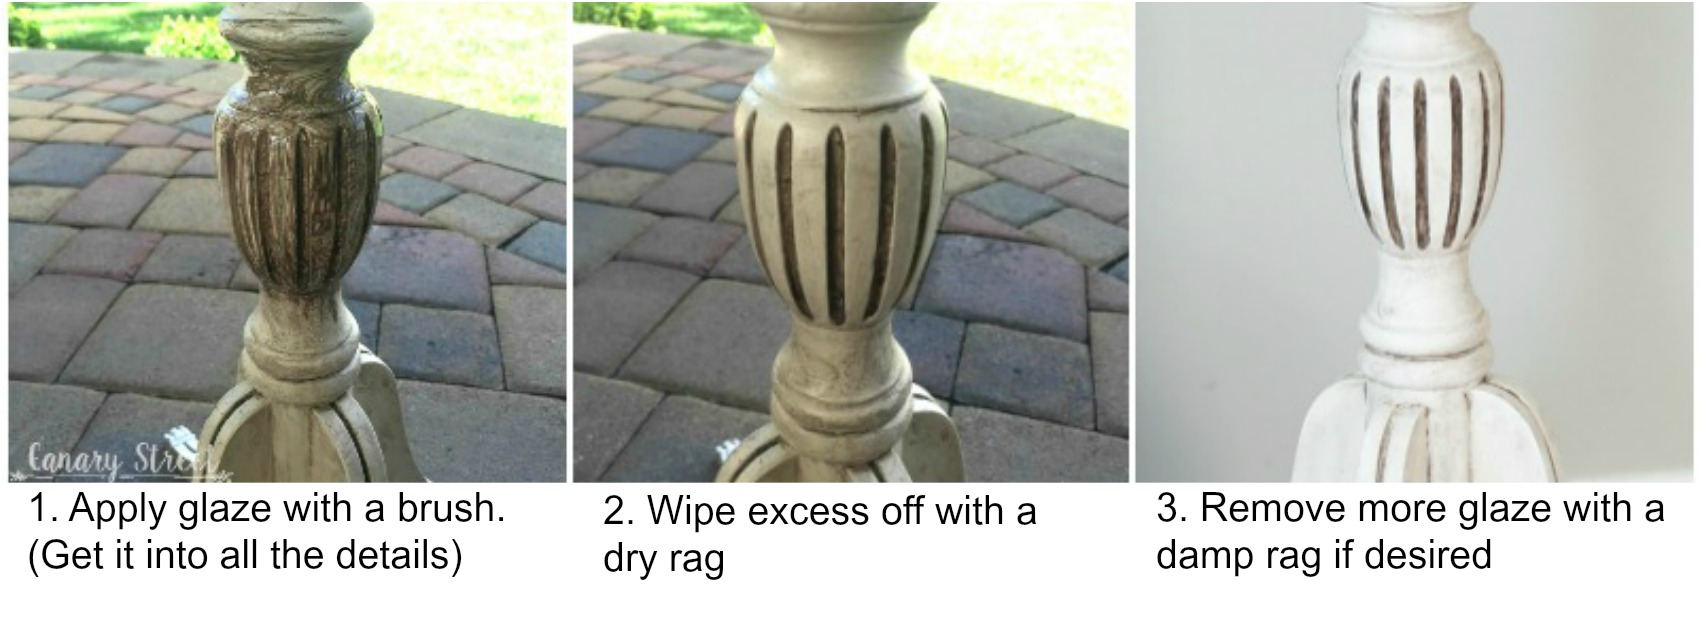 How to apply dark glaze and why to use glaze instead of wax.  https://canarystreetcrafts.com/